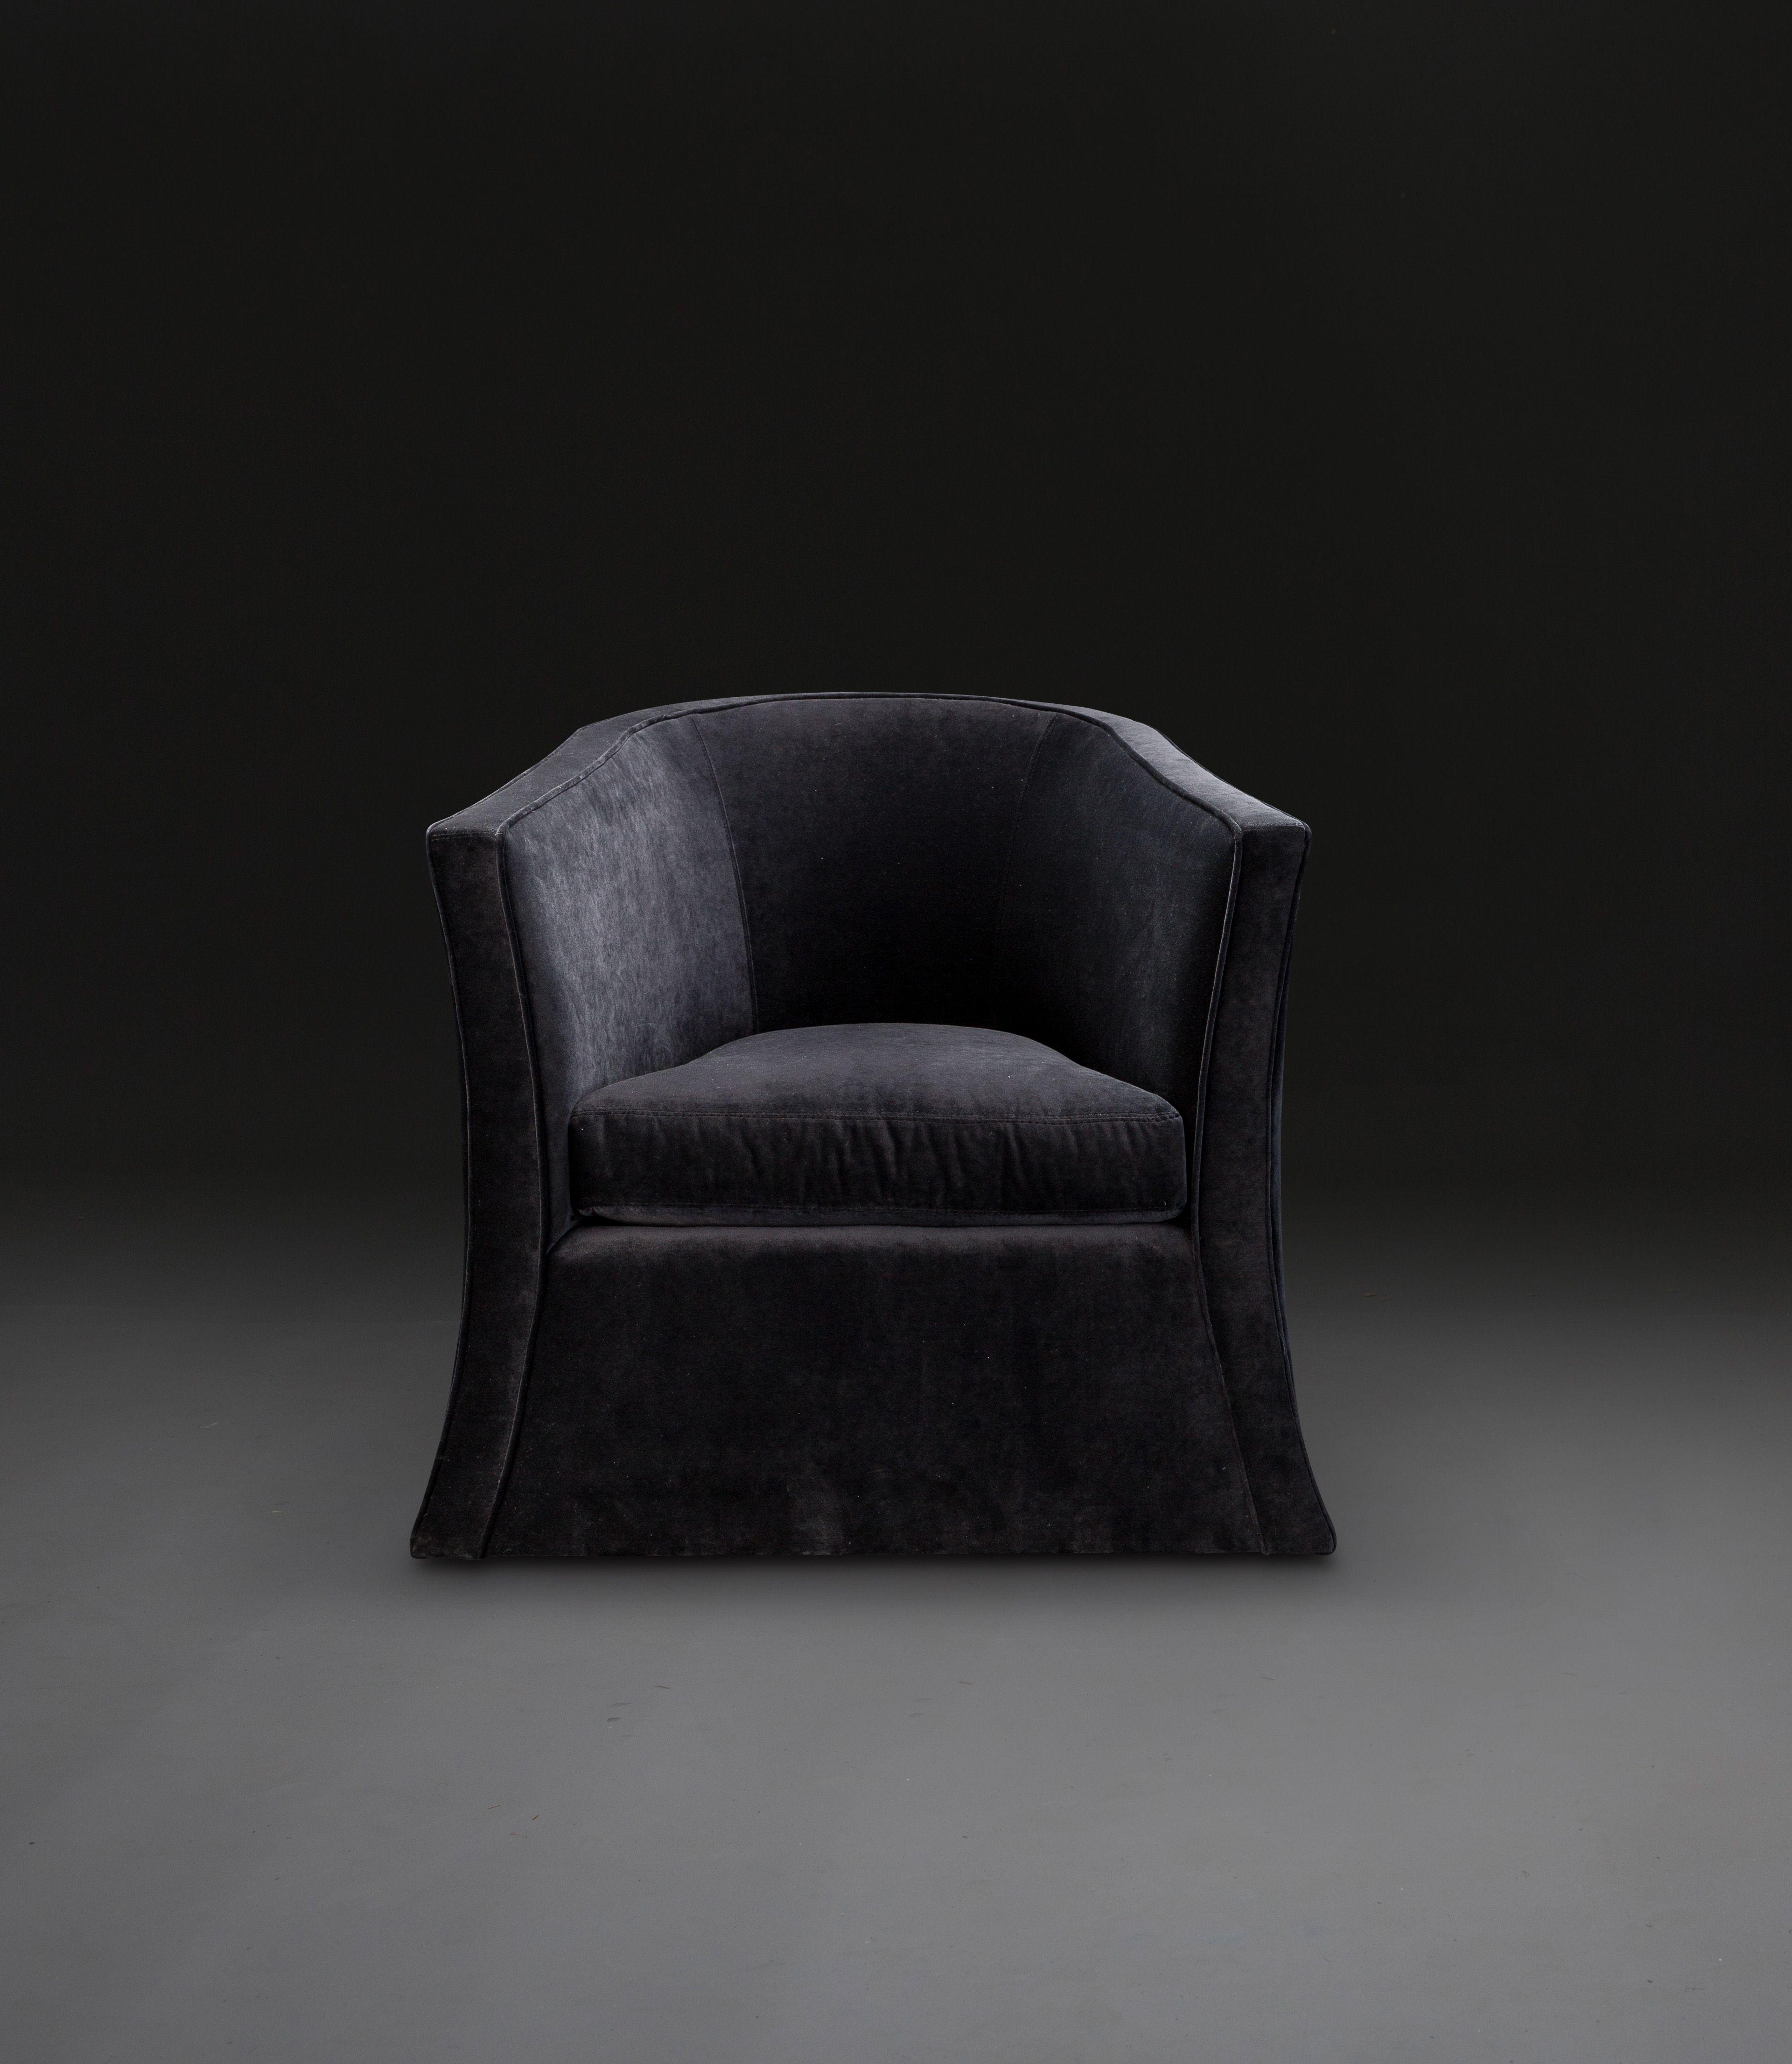 Beautiful Axelle Swivel Chair By Verellen Design